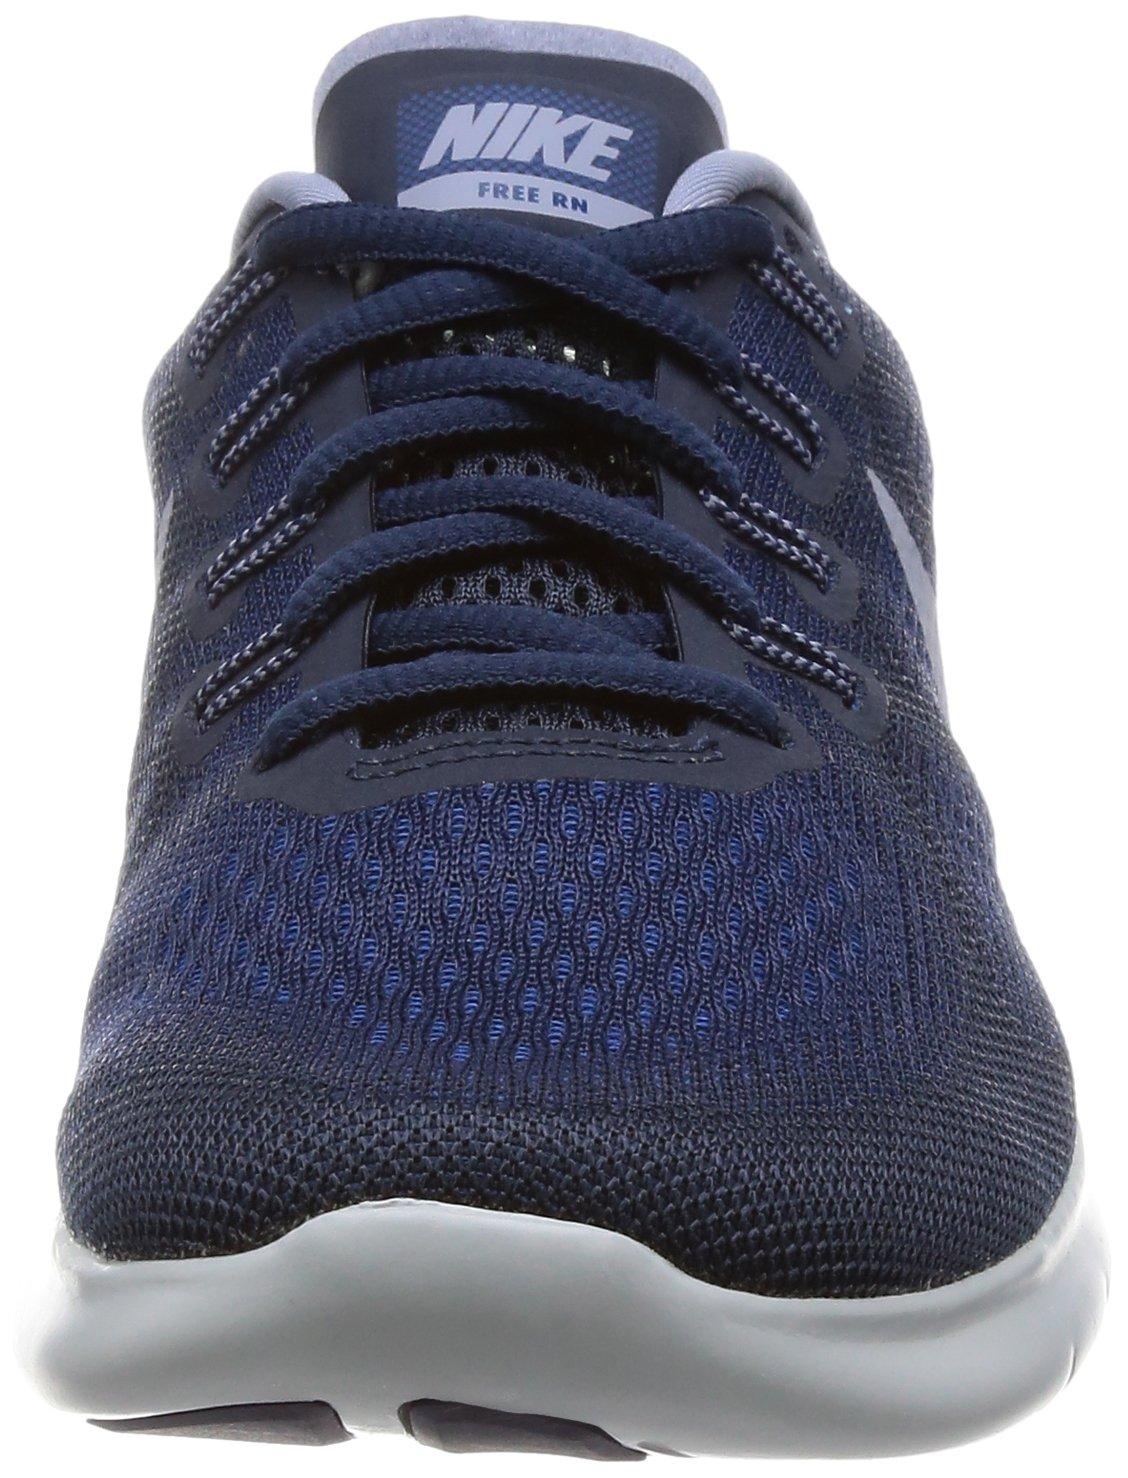 Nike Free RN 2017 Women's Running Shoes (6 M US, Binary Blue/Dark Sky Blue) by Nike (Image #4)